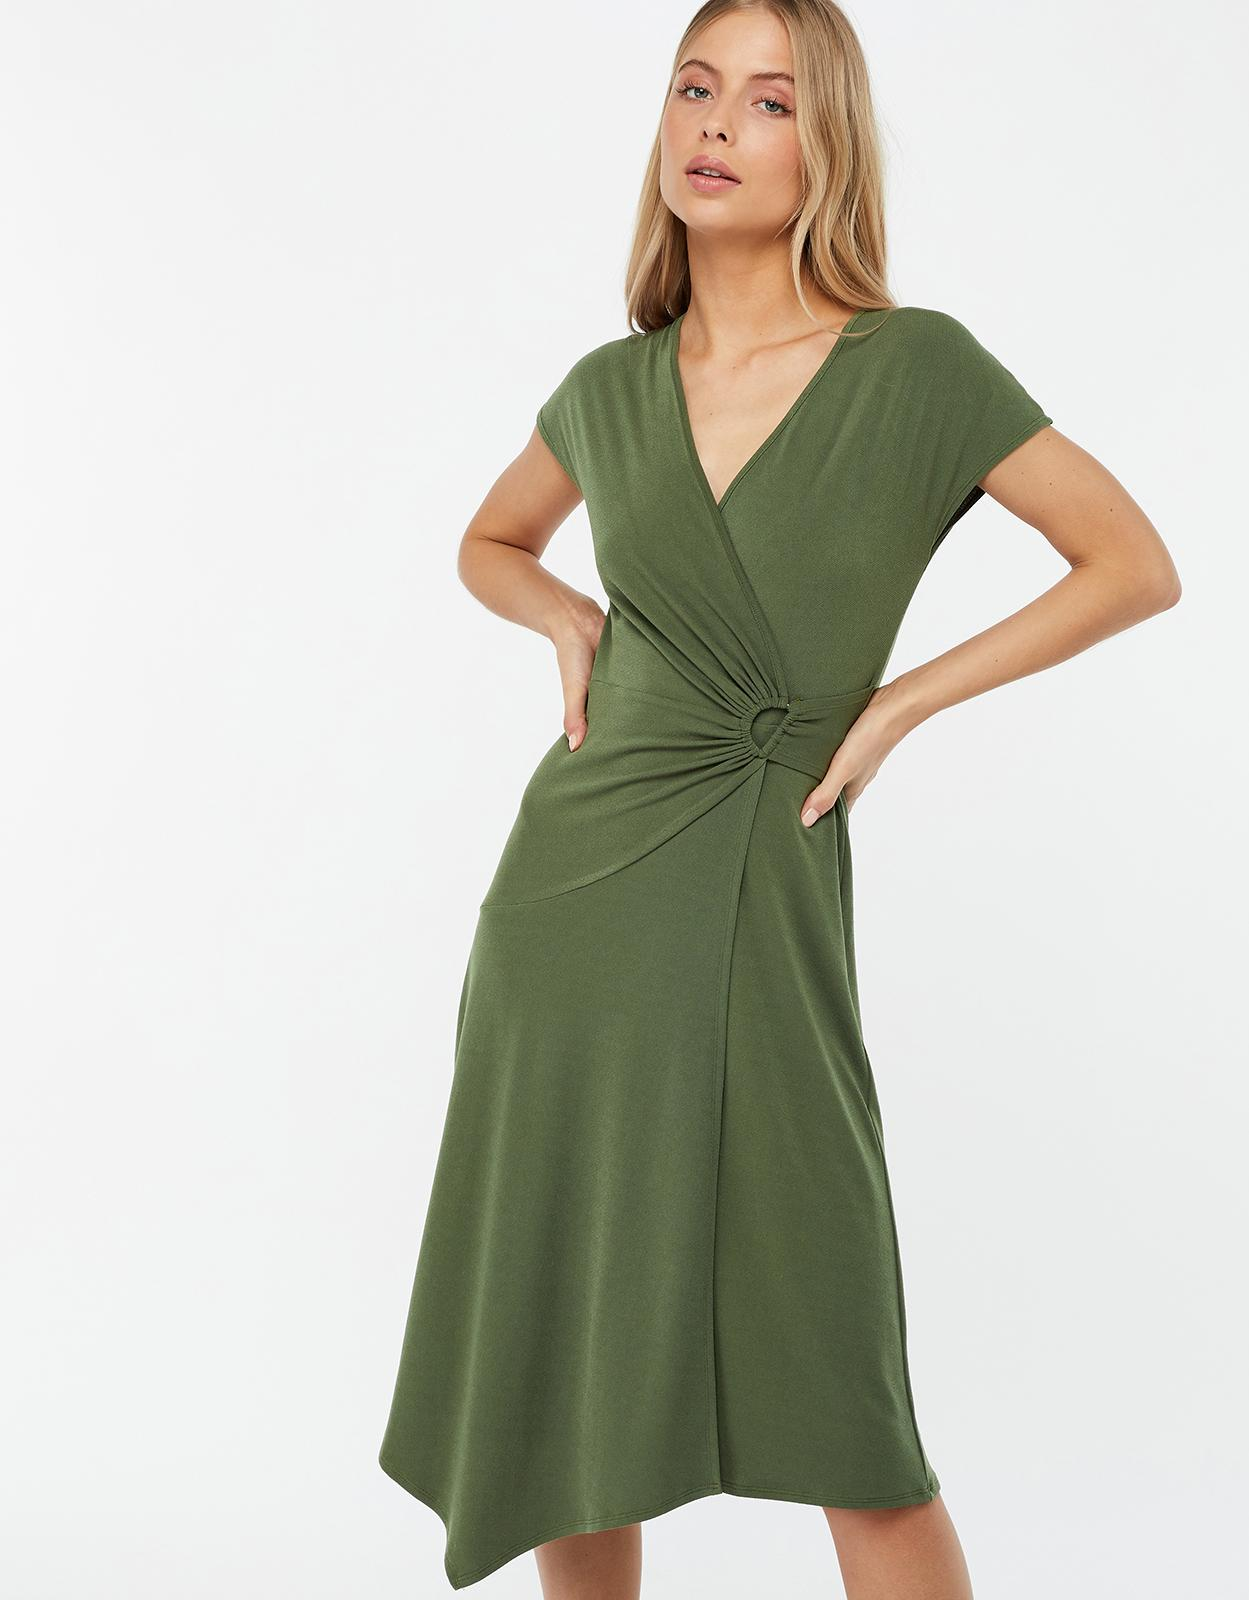 31e7346677f8 Monsoon Green 'katy' D Ring Jersey Midi Dress in Green - Save 27% - Lyst